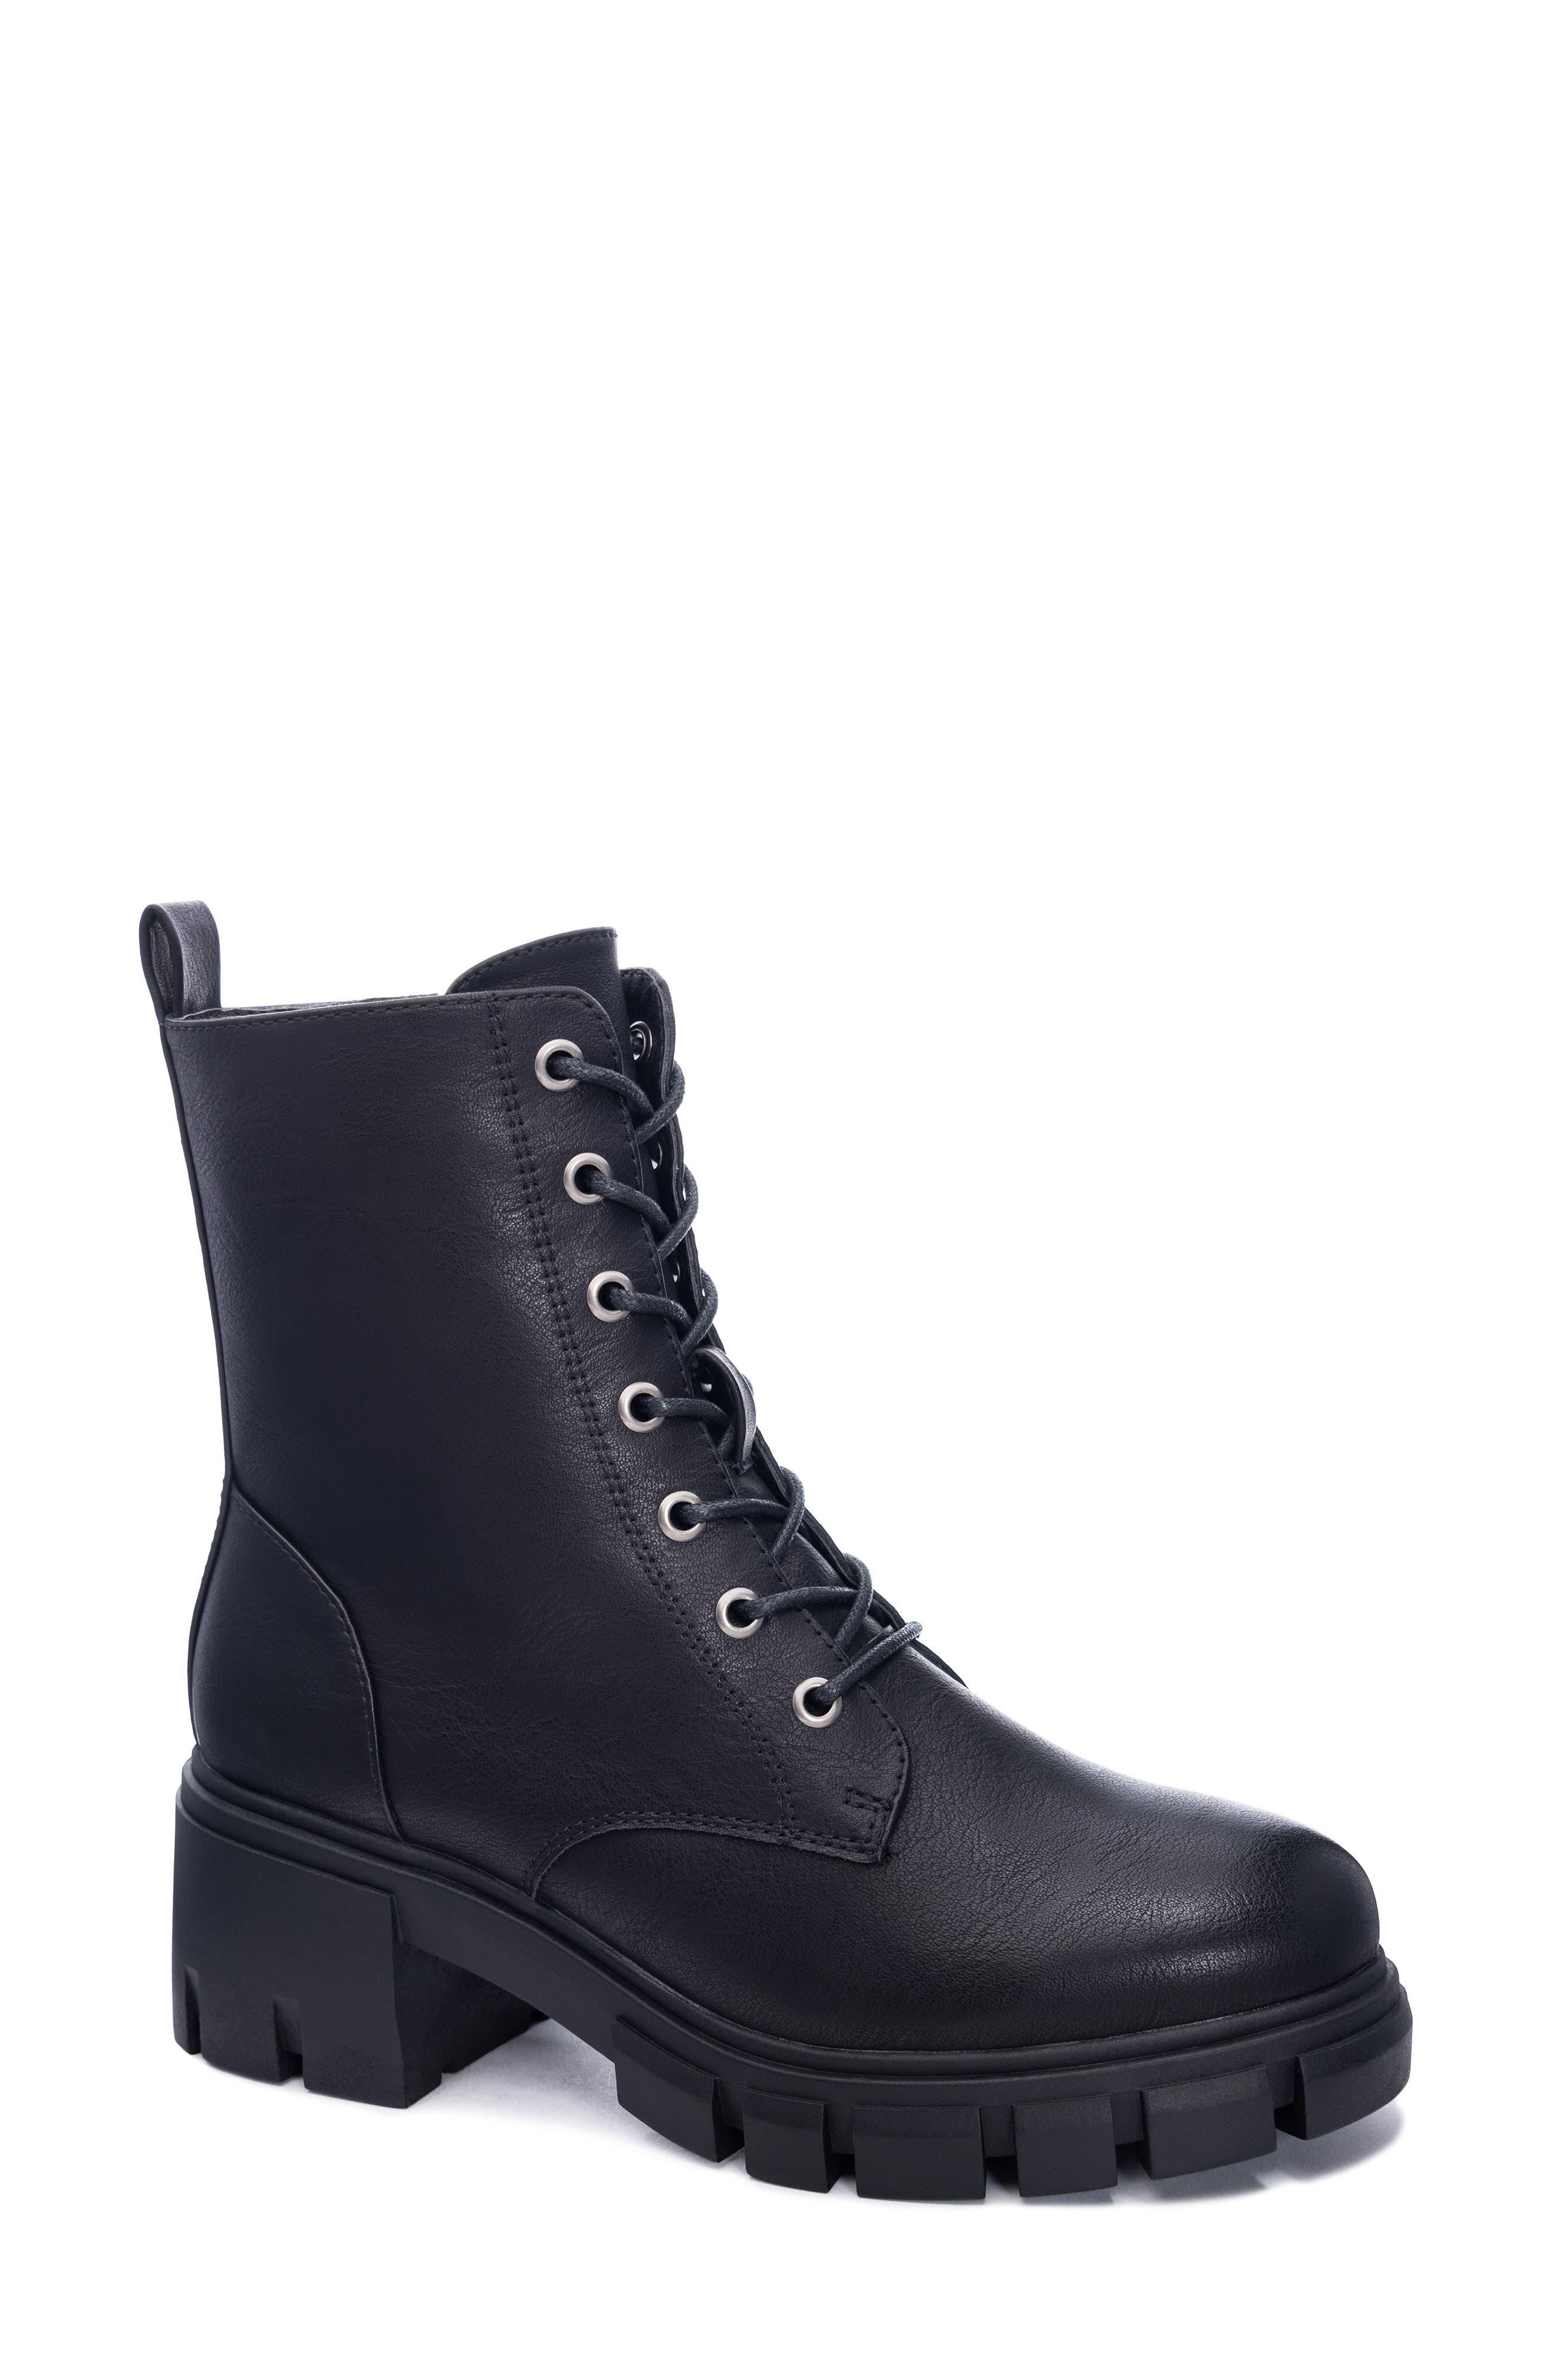 Newz Combat Boot